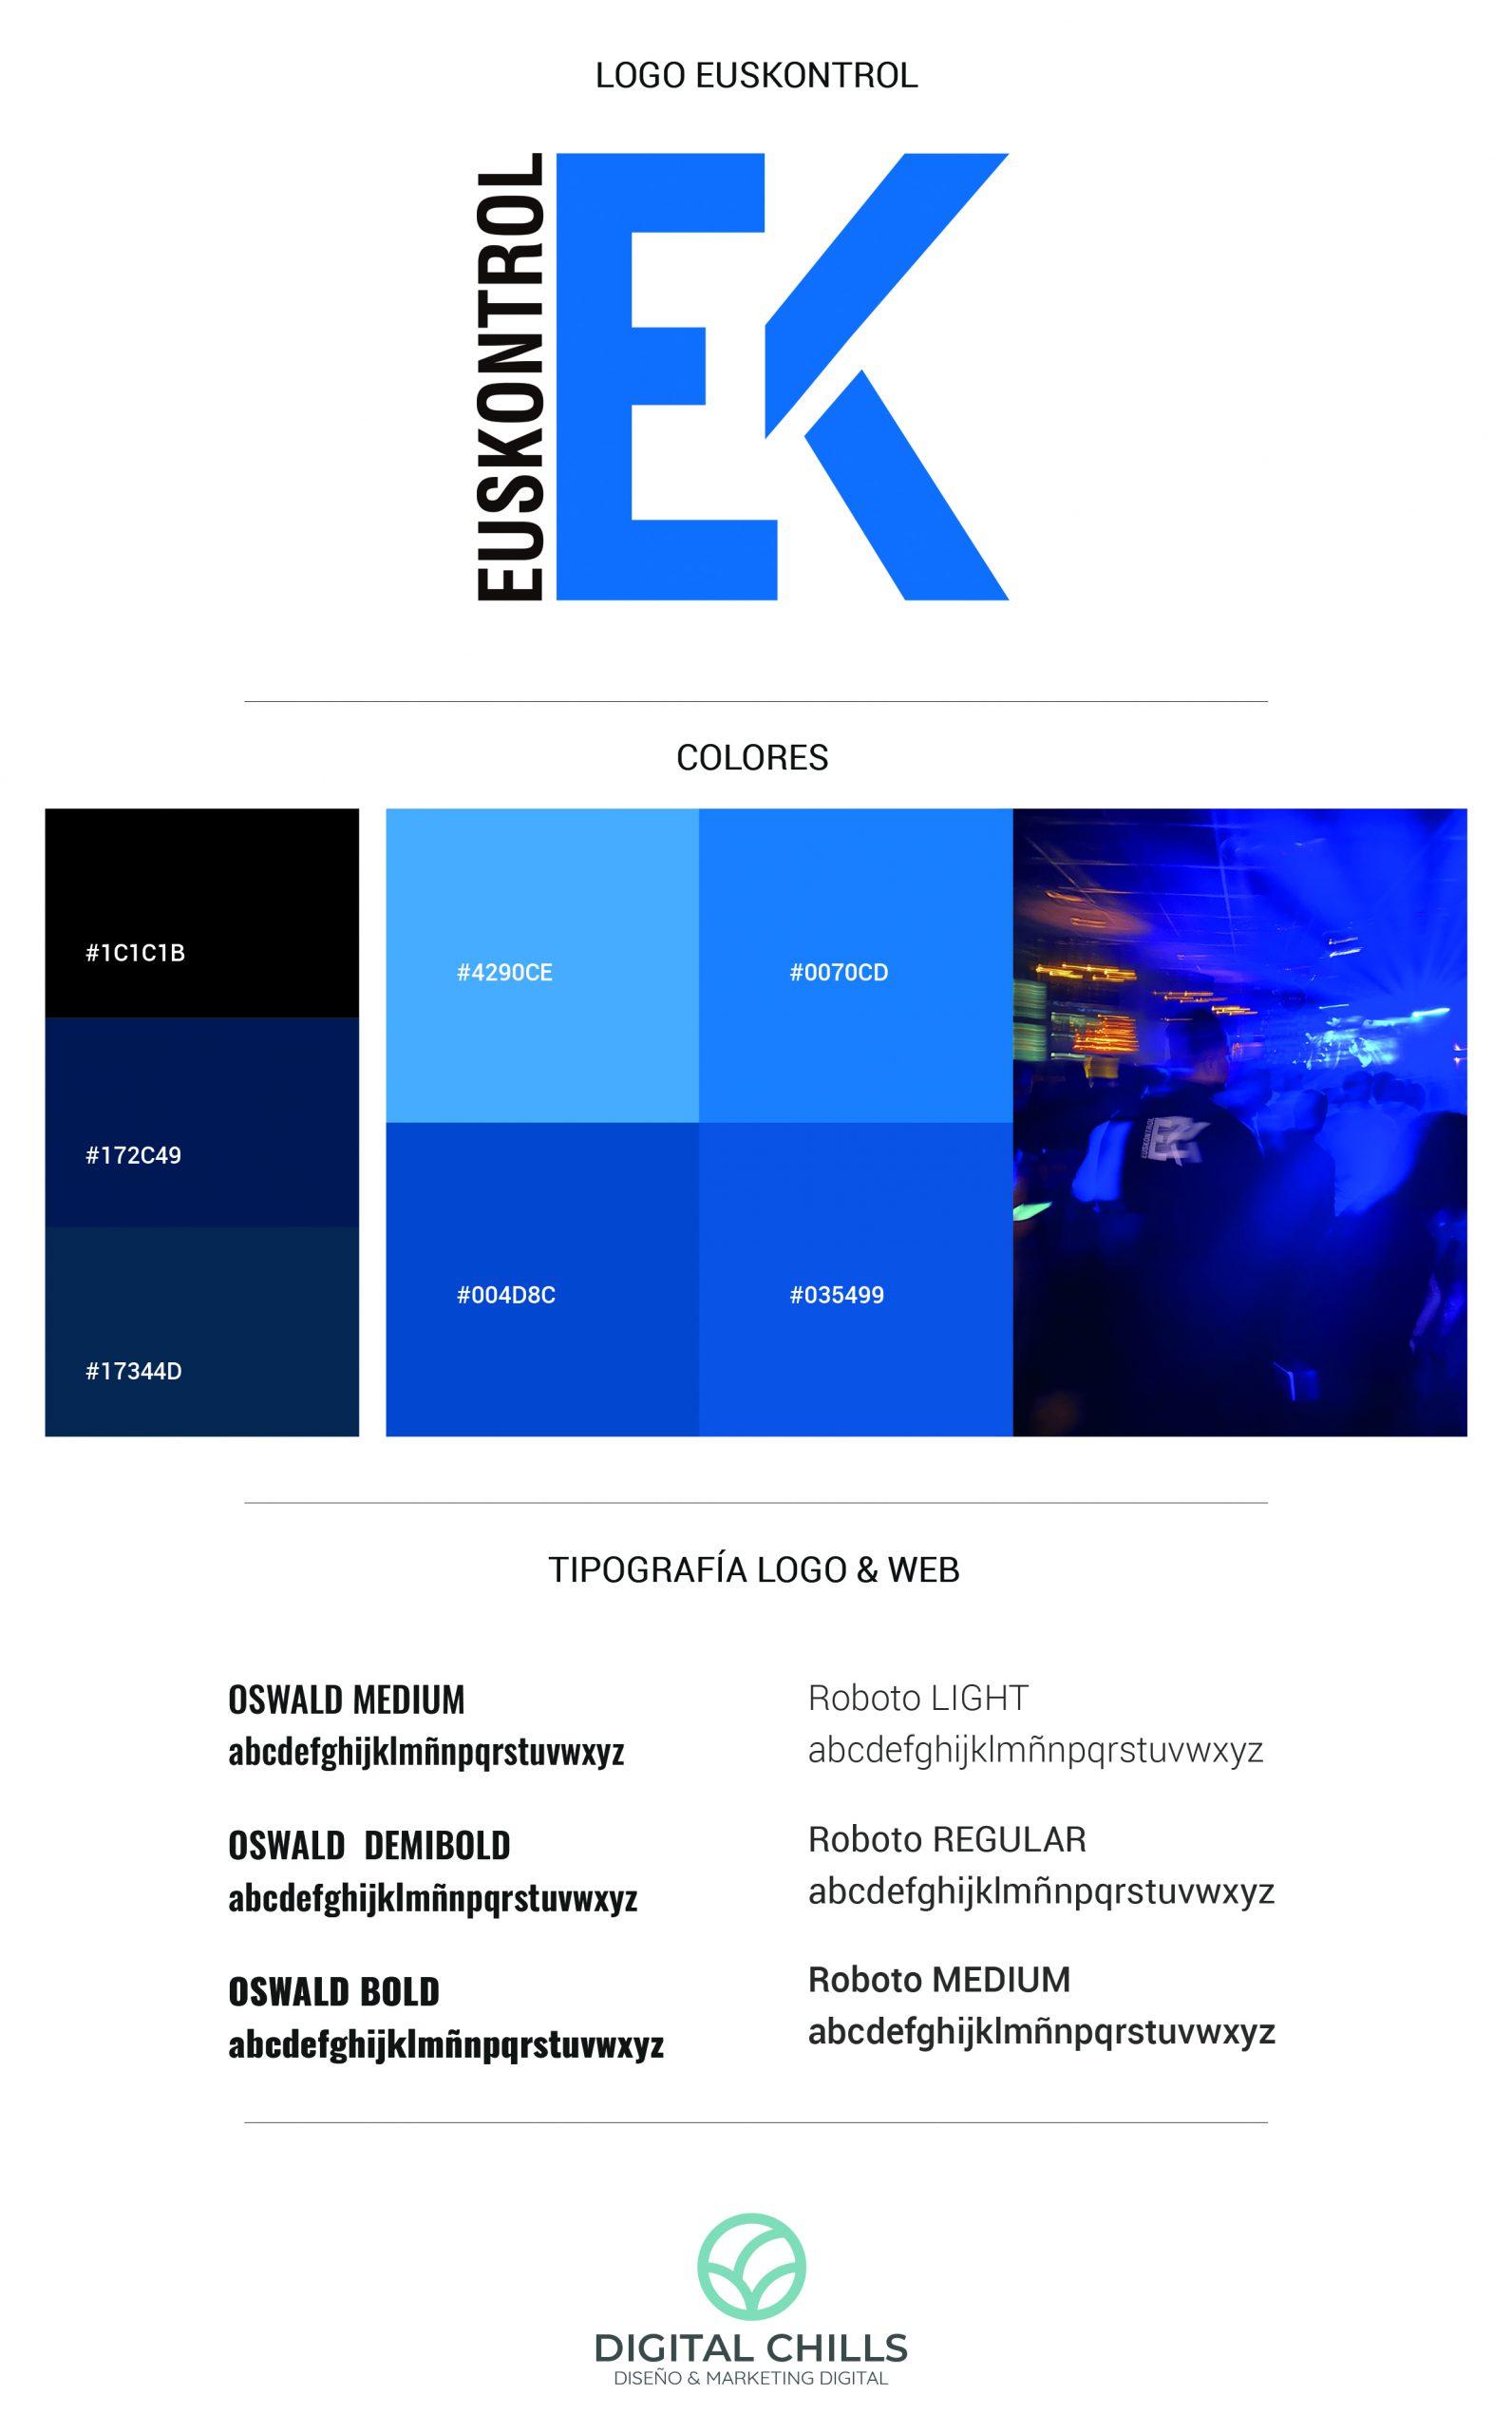 Euskontrol | DIGITAL CHILLS Diseño & Marketing Digital